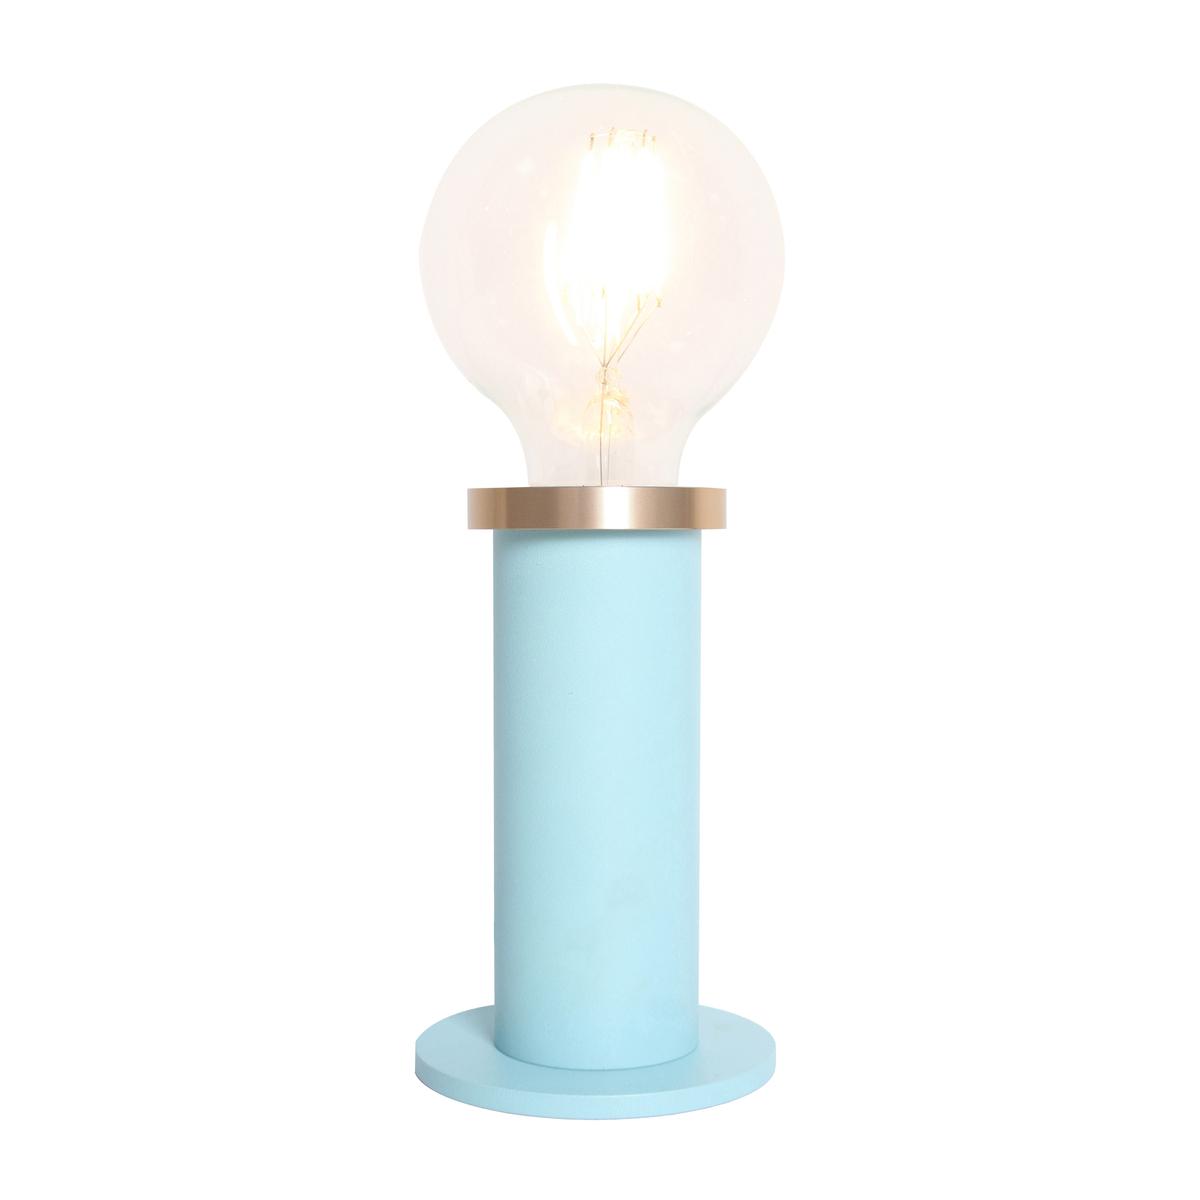 Pied de lampe en métal bleu